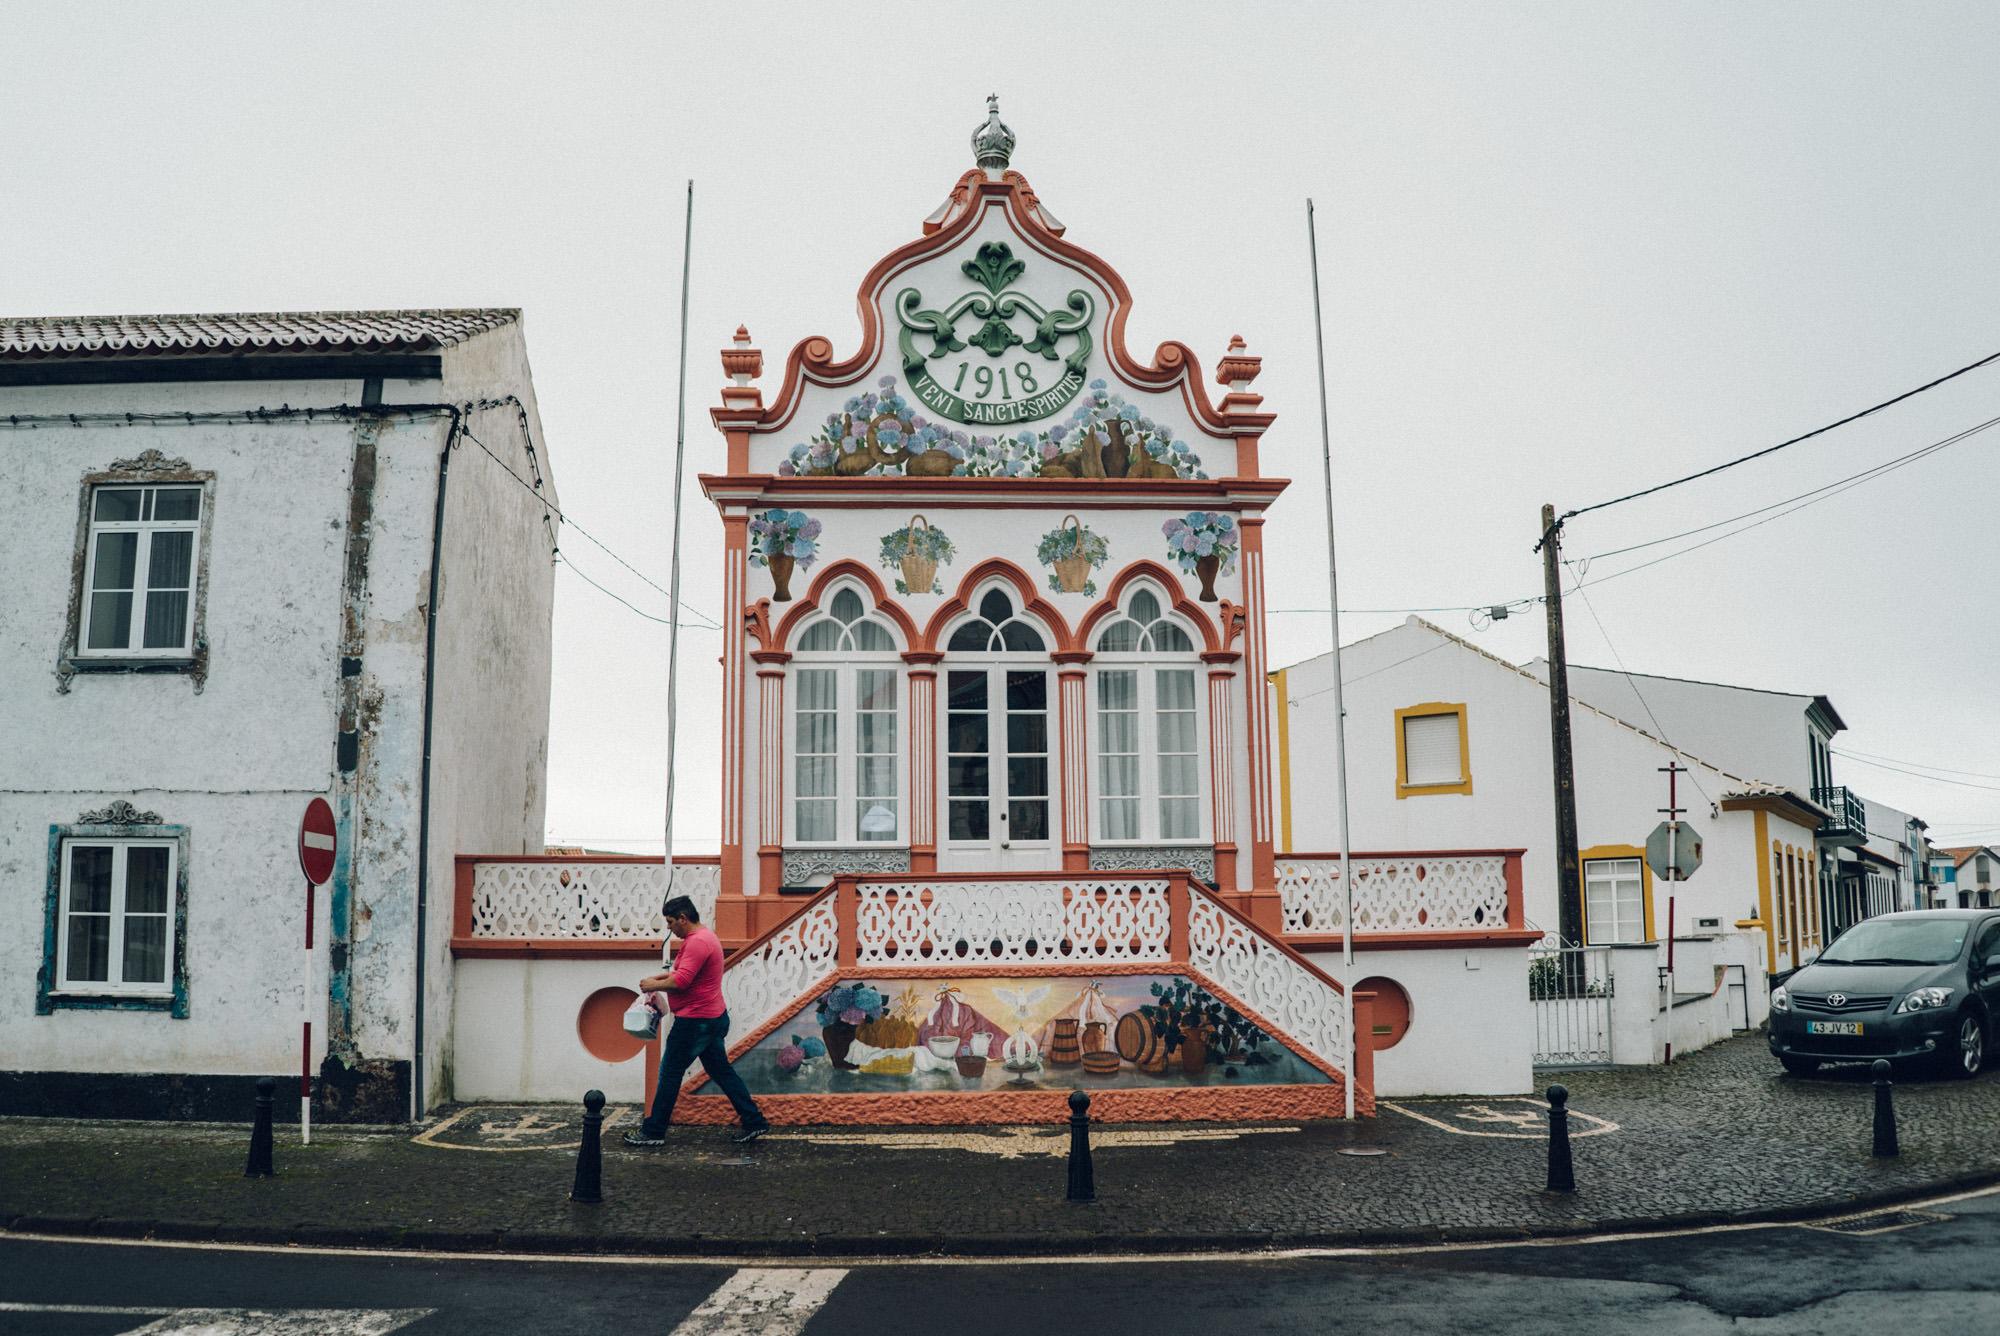 wrenee-renee-lusano-azores-portugal-5.jpg